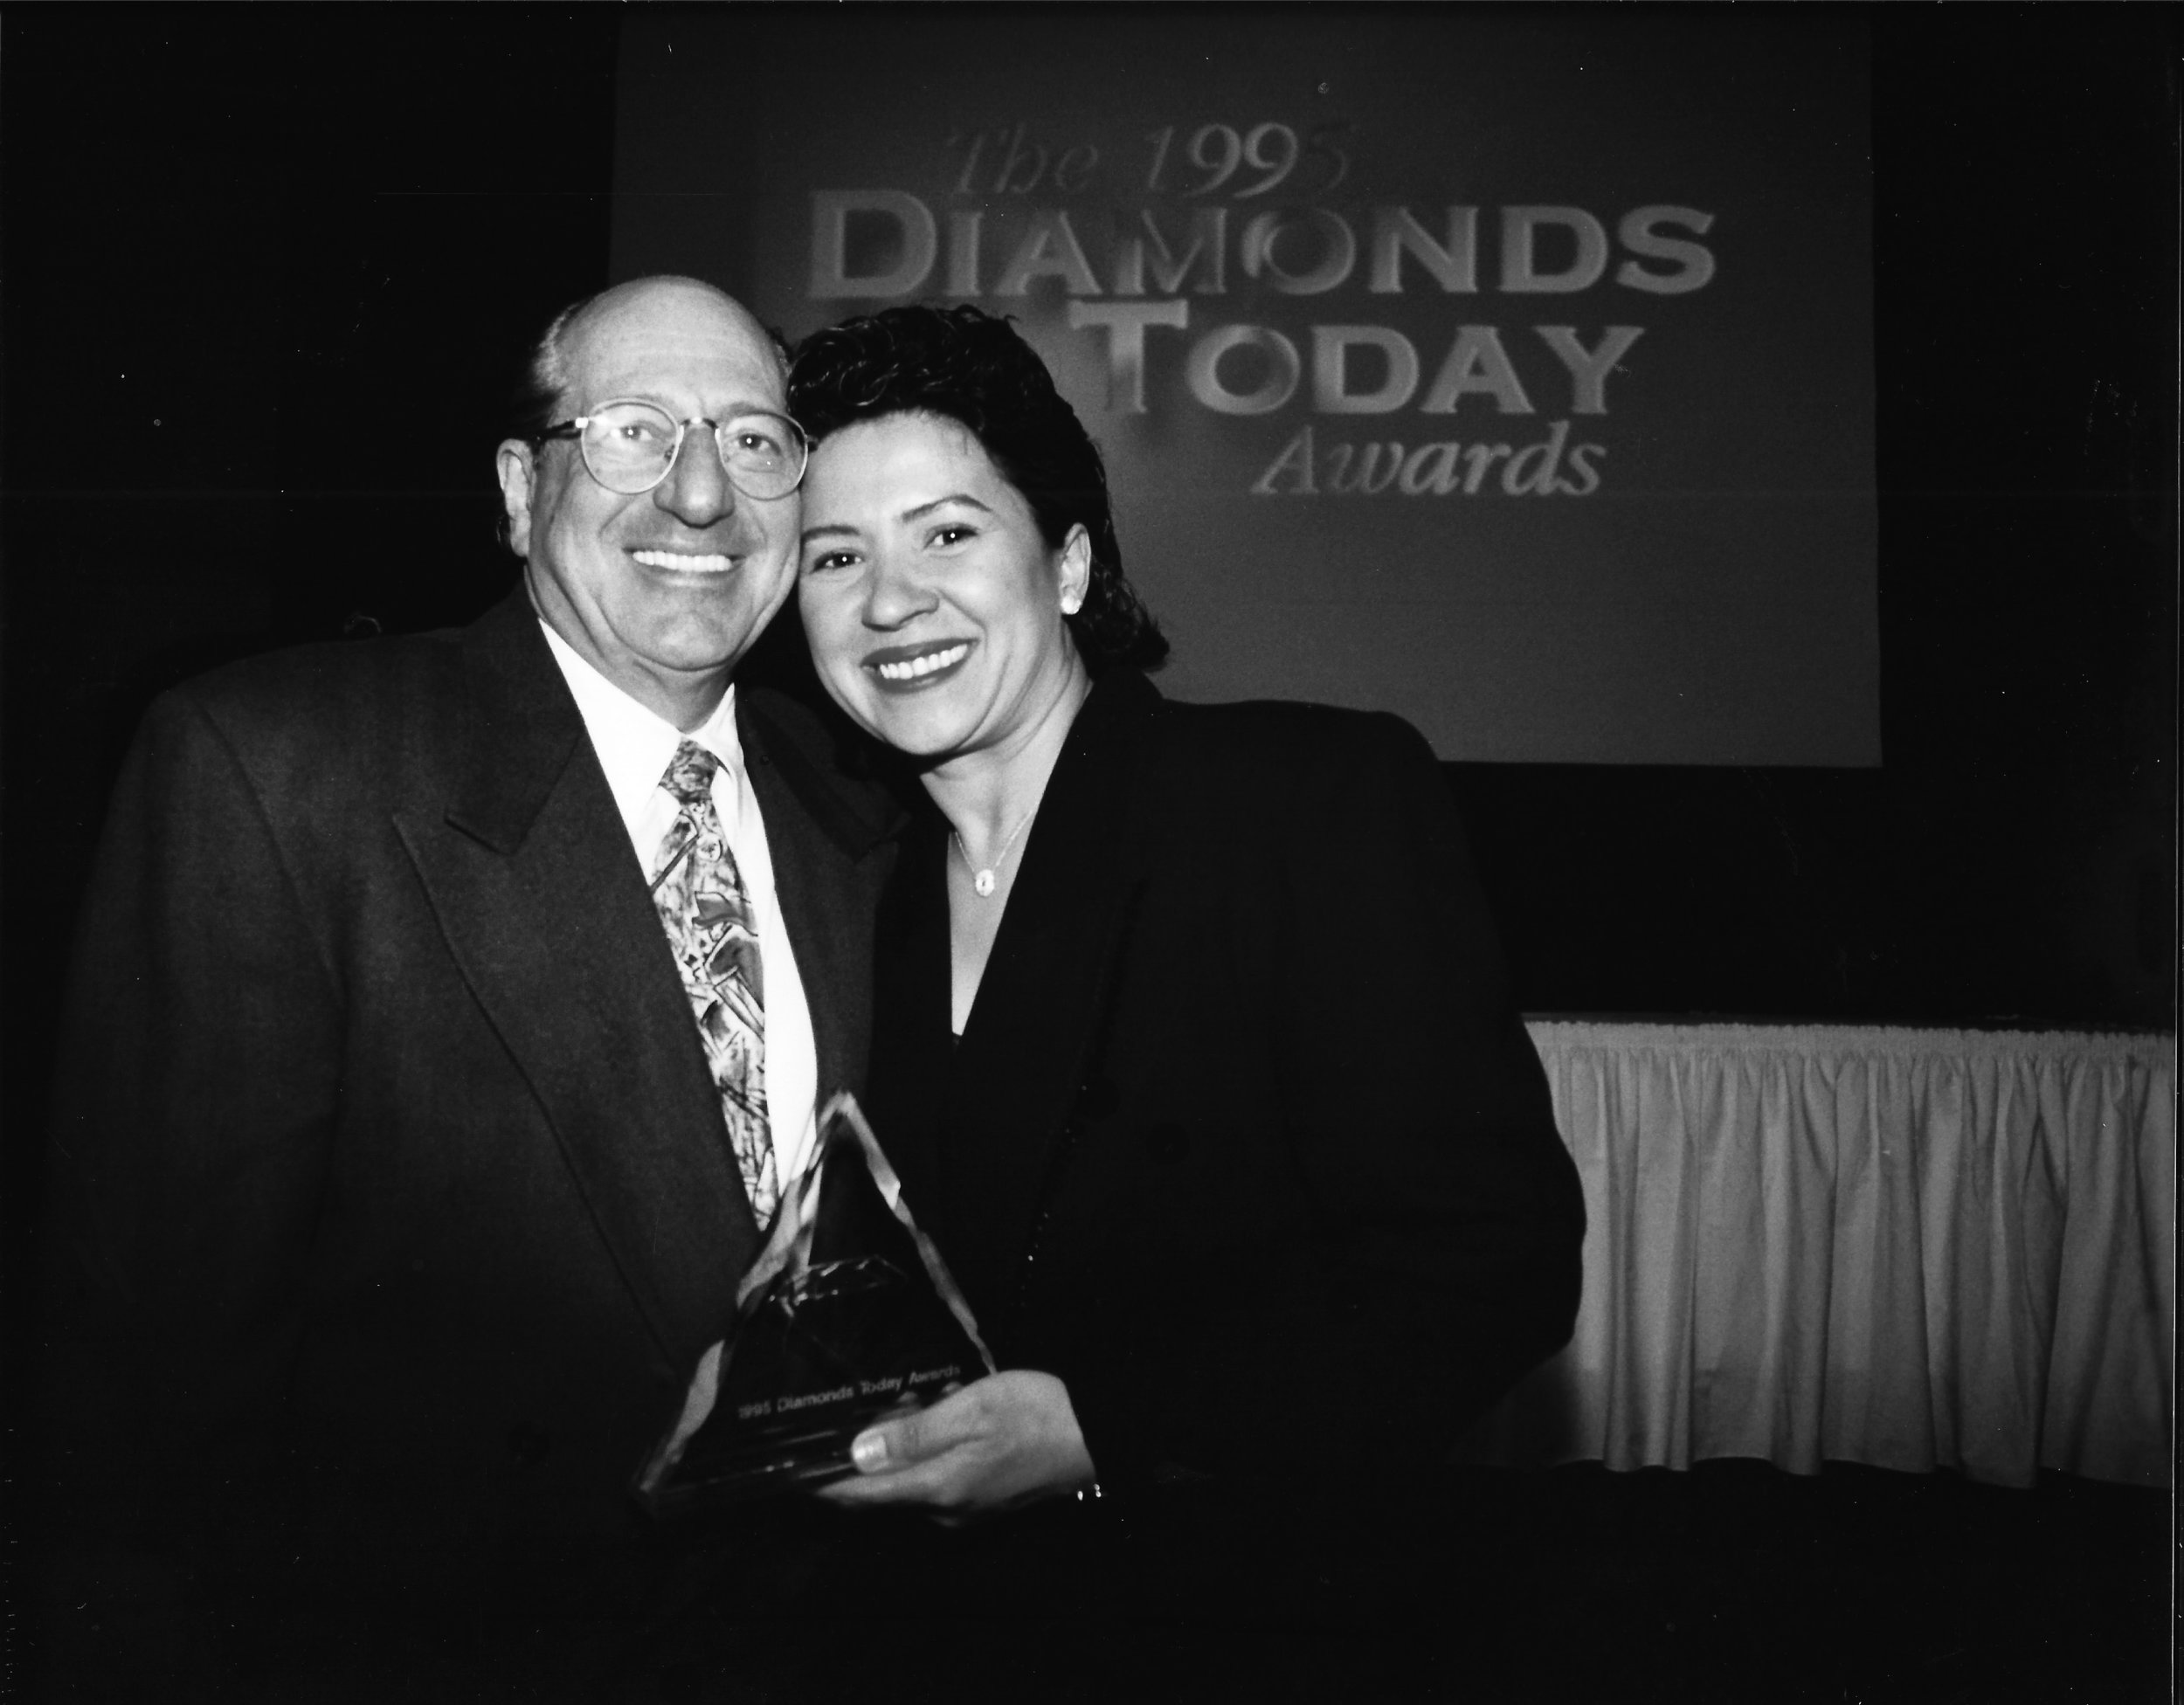 Maggie Hess winner of The Diamonds Today Awards 1995.jpg